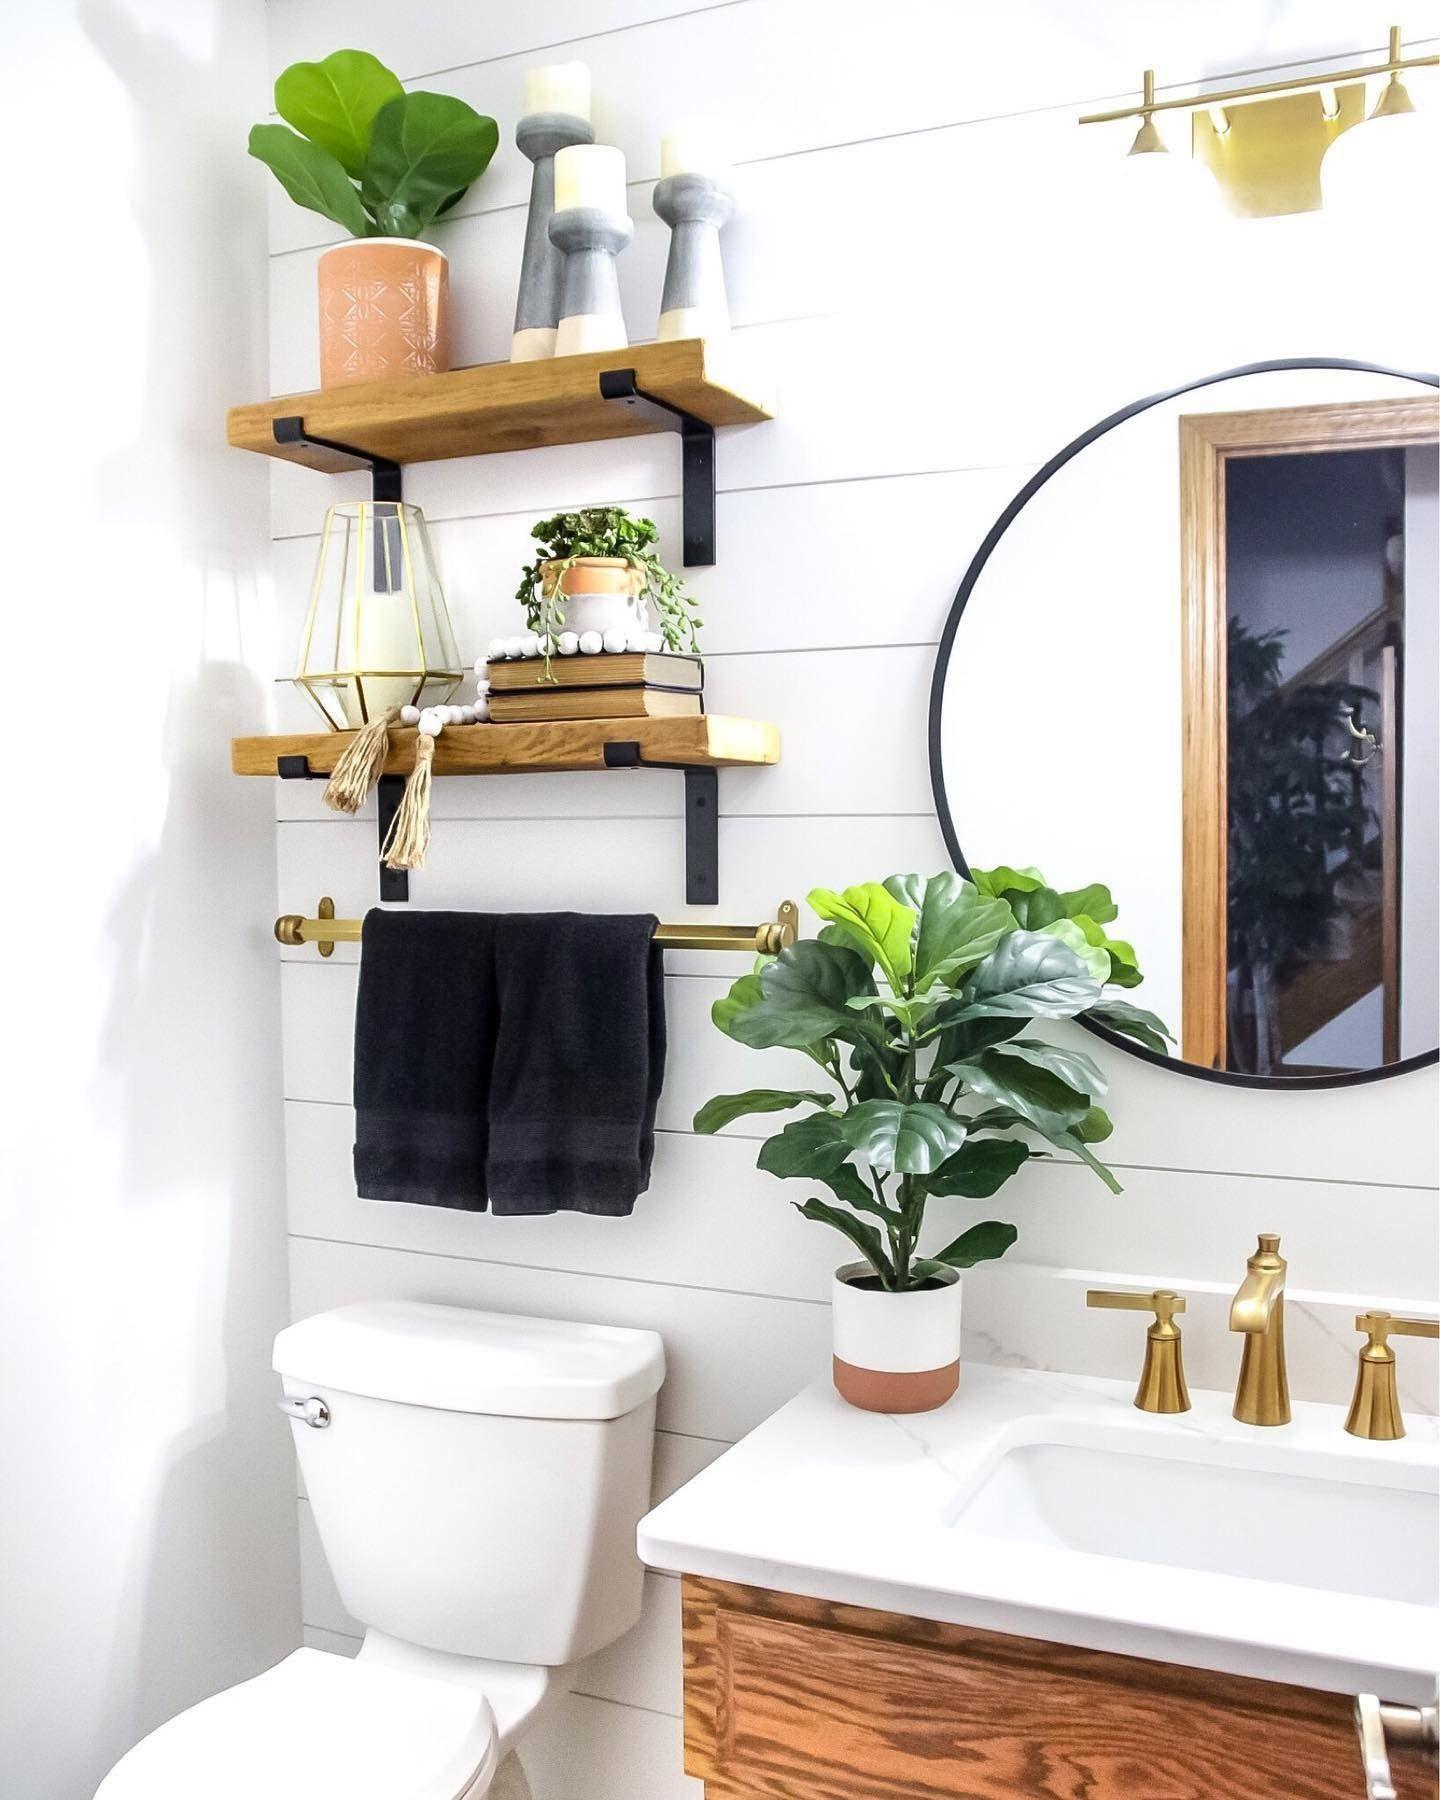 60 Bathroom Decor And Organization Ideas In 2021 Bathroom Decor Decor Kirklands